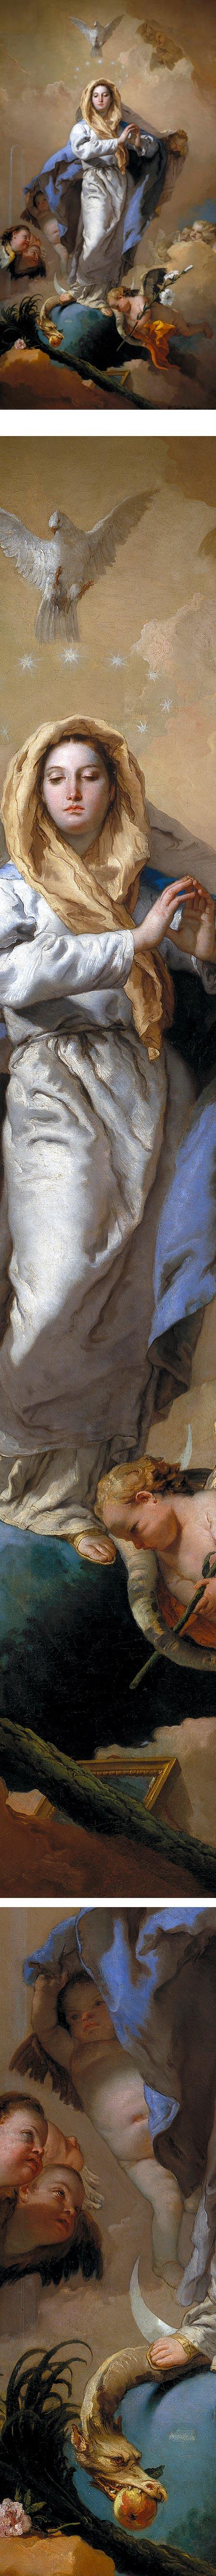 The Immaculate Conception, Giambattista Tiepolo